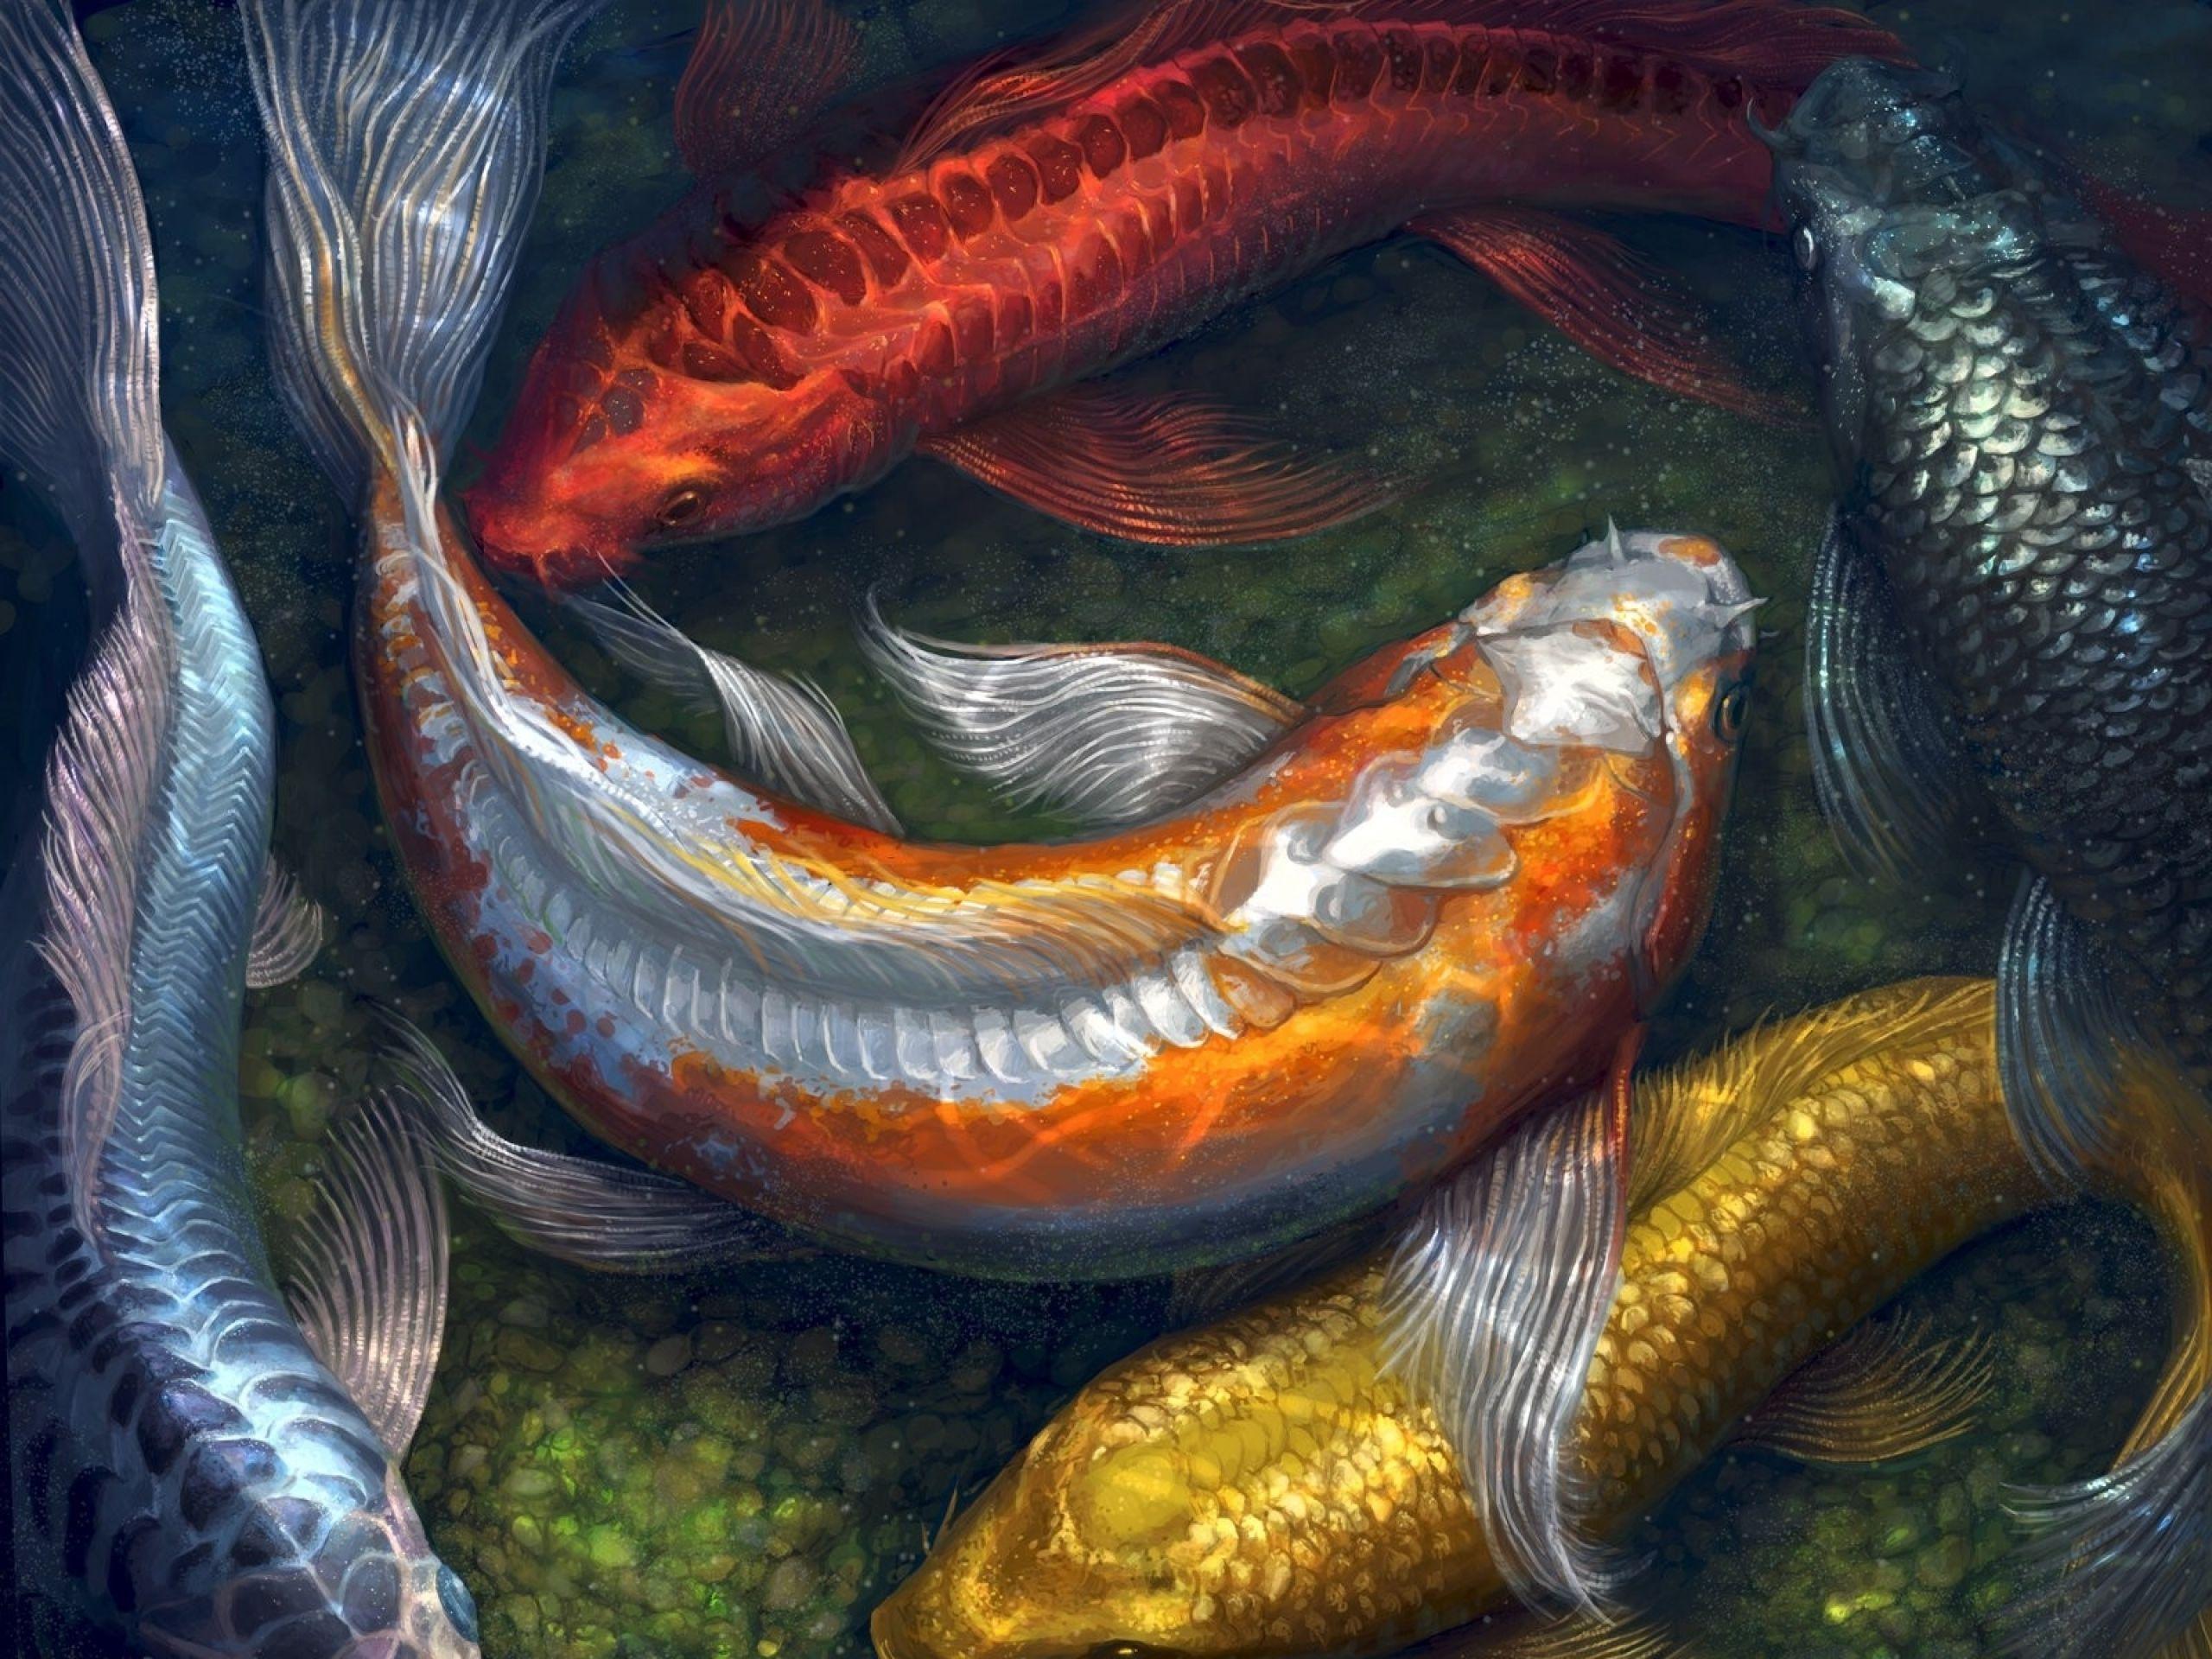 Water Paintings Fish Koi Artwork Pebbles 1600x1250 Wallpaper Art Hd Wallpaper Koi Art Water Painting Fish Painting